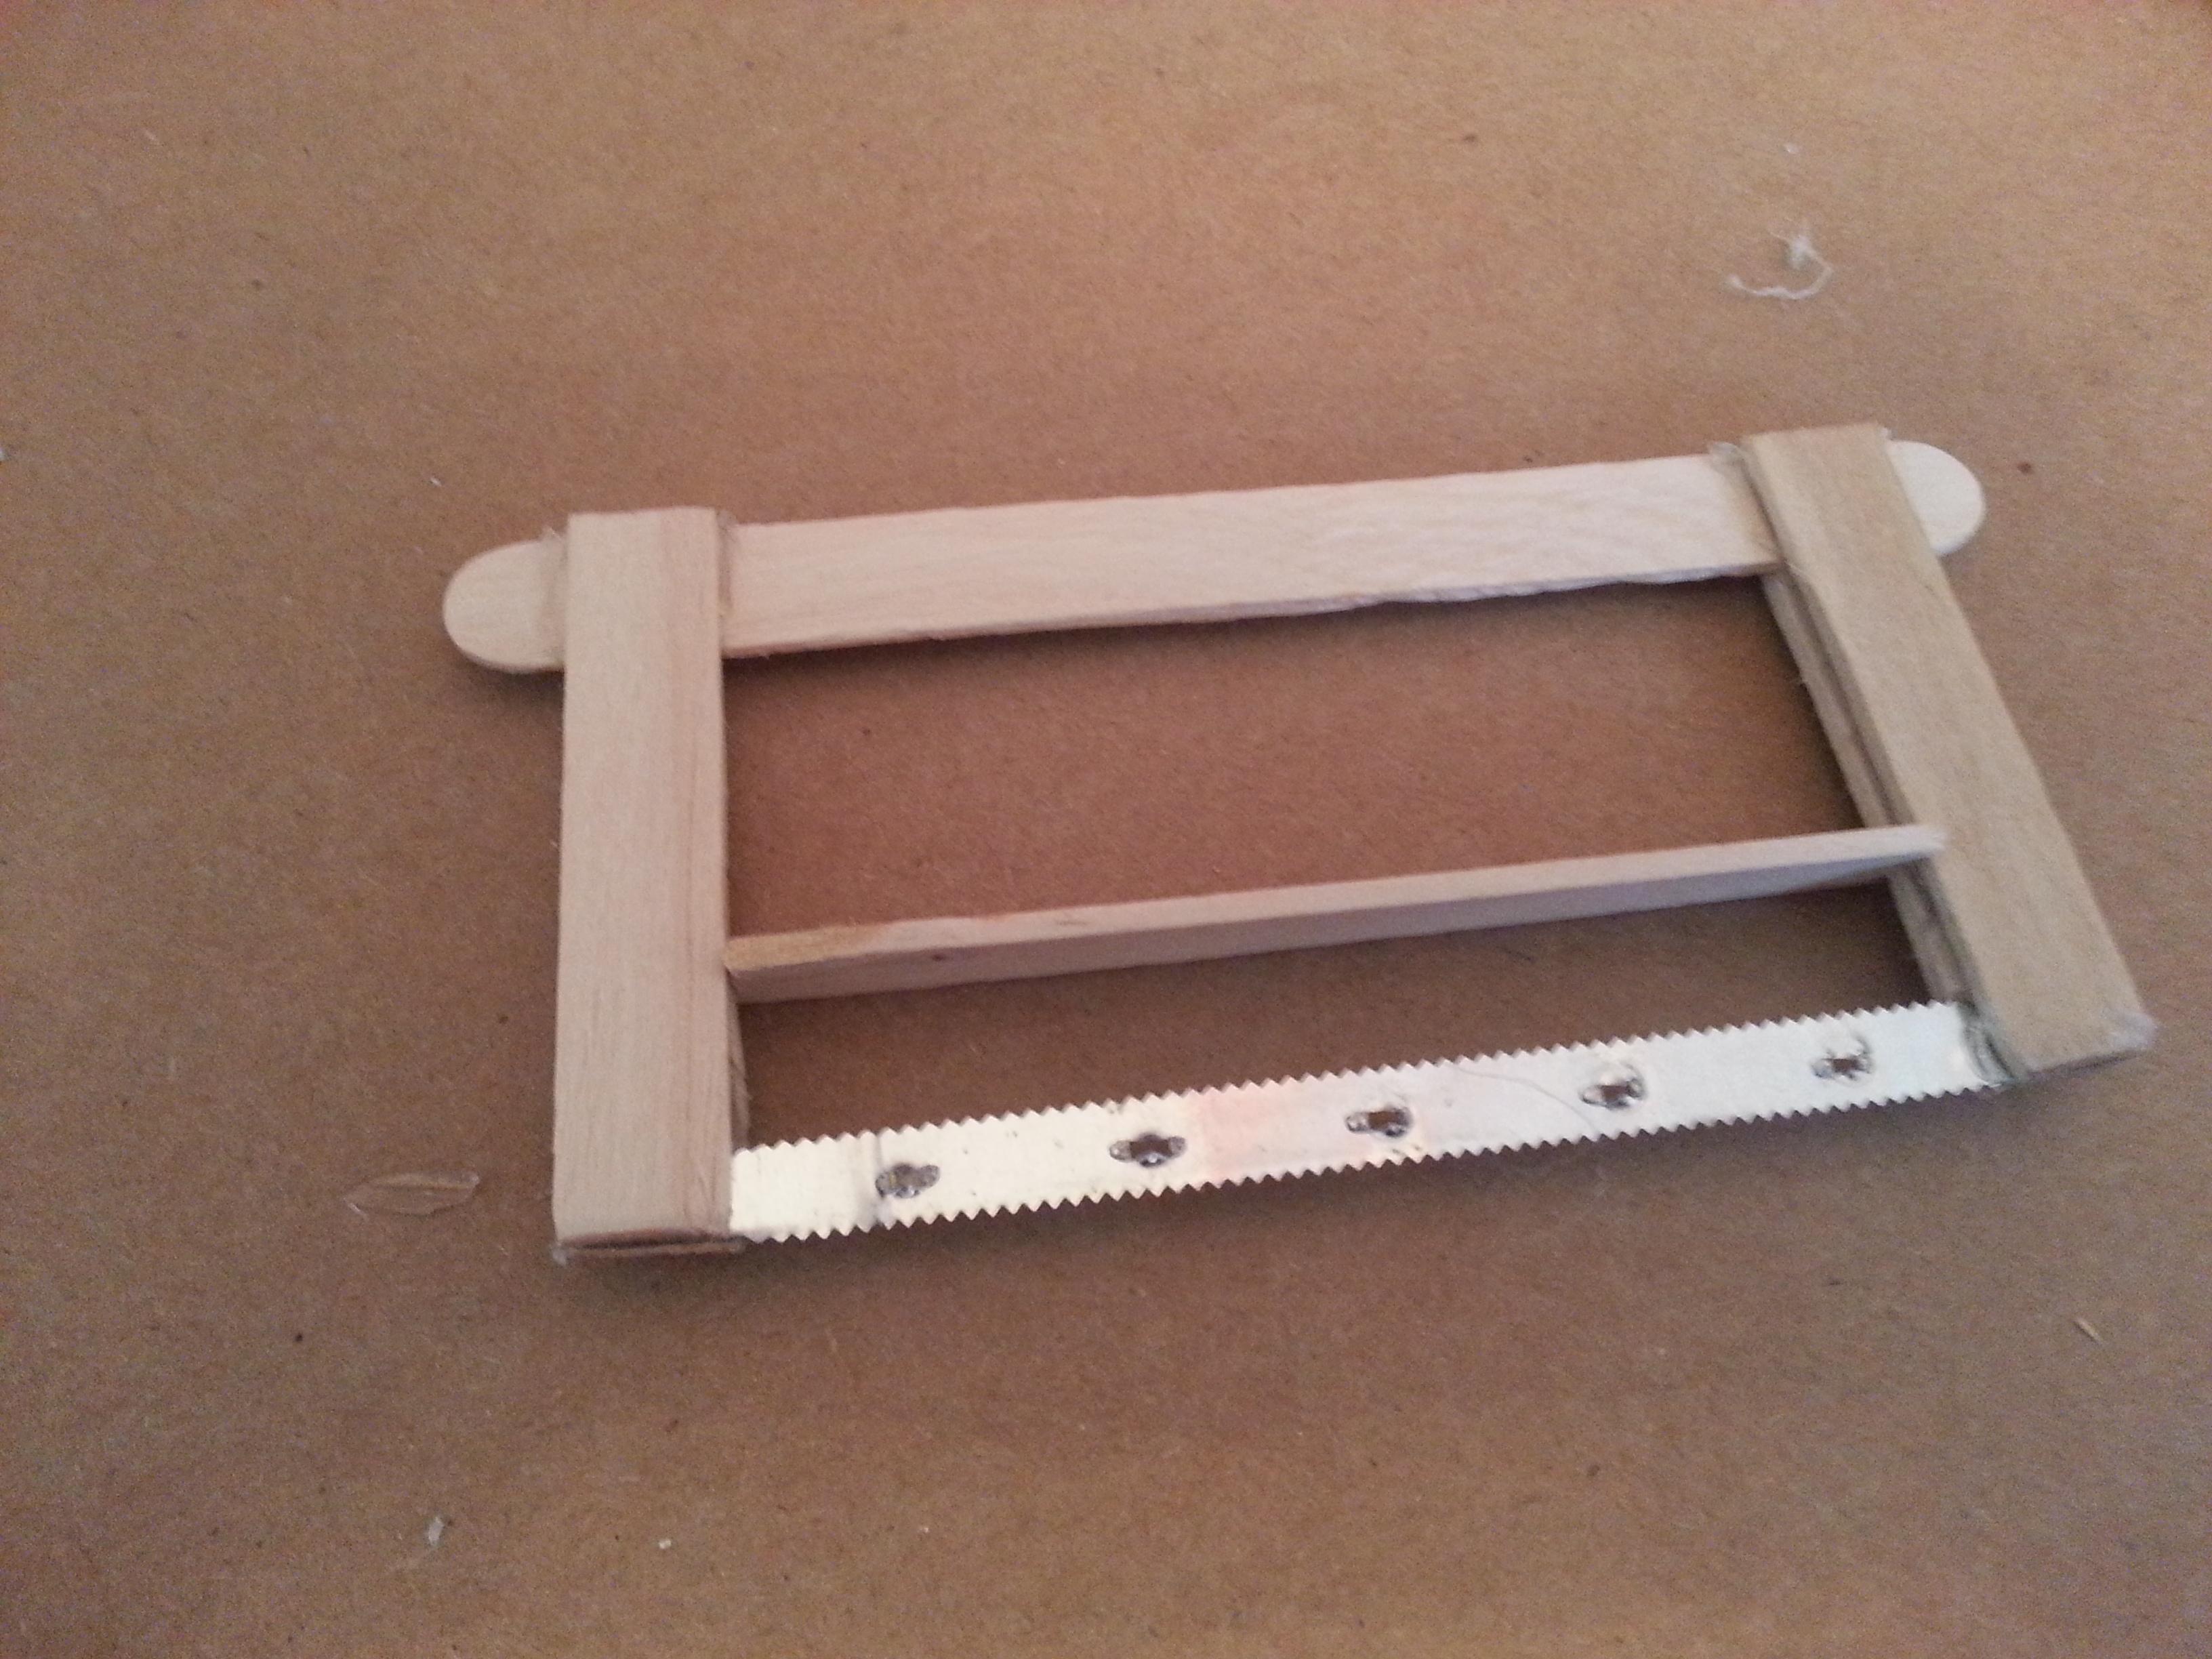 Picture of Diy Homemade Mini Hacksaw